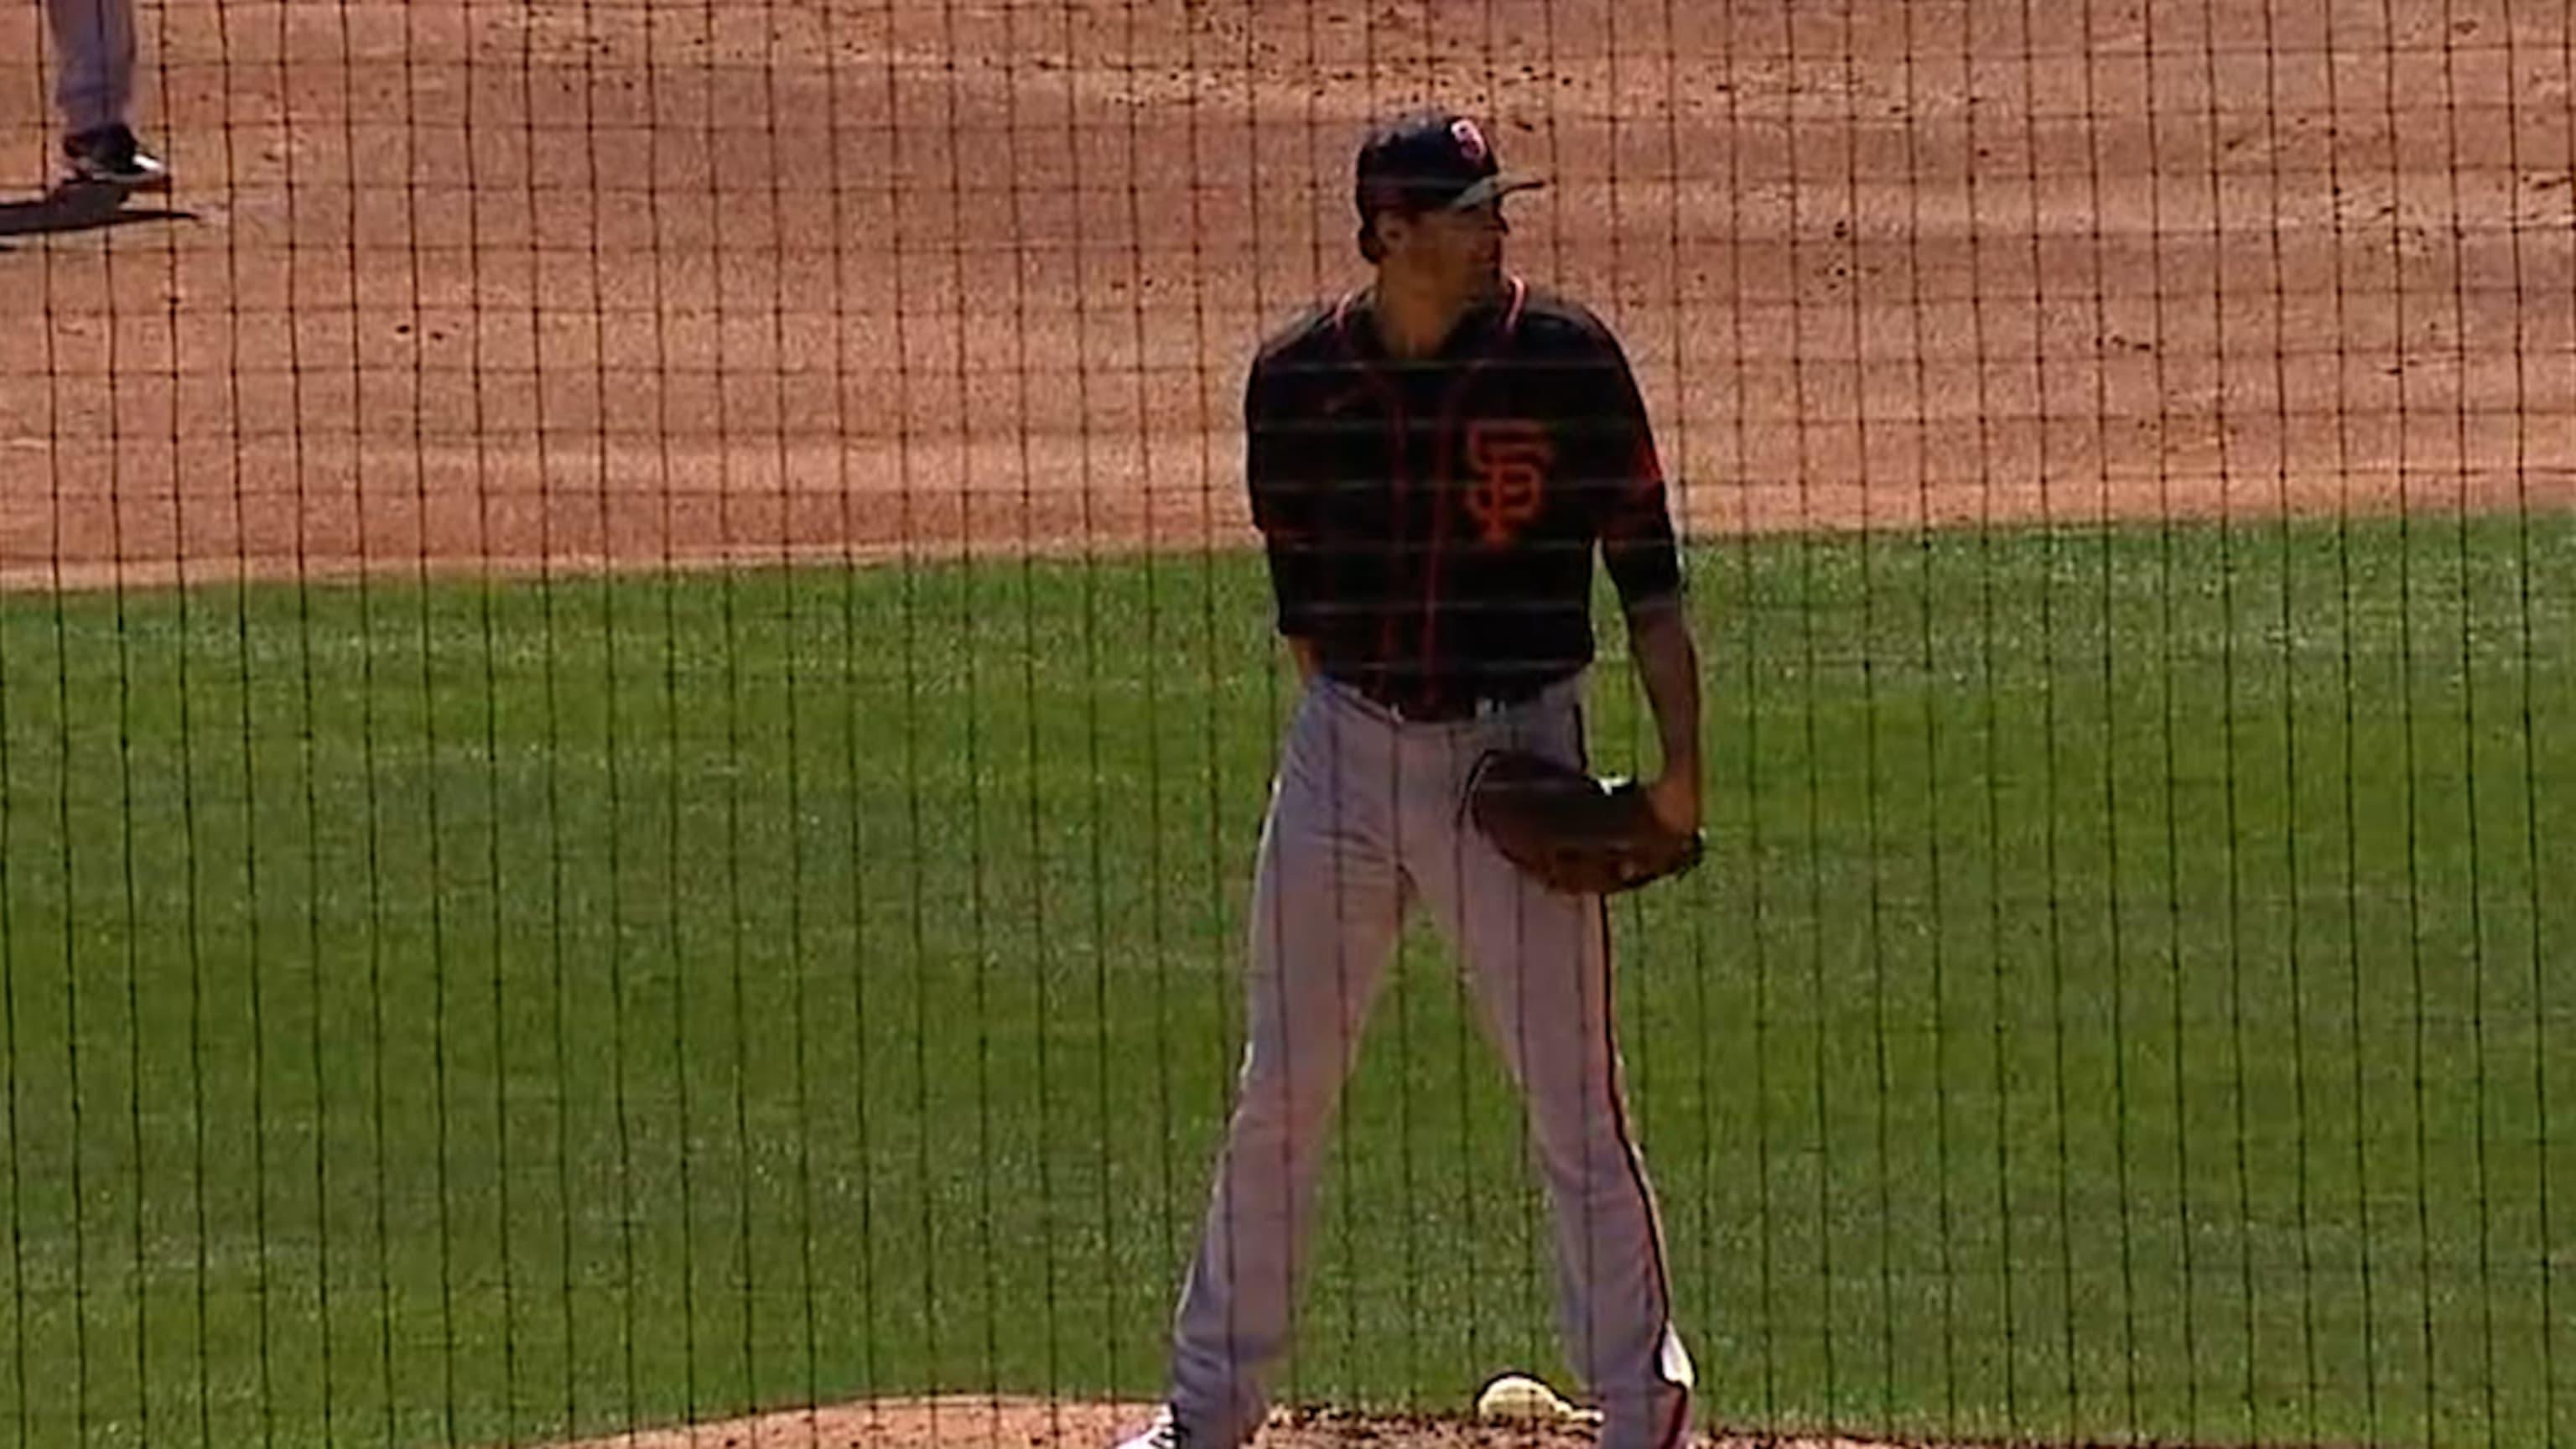 Kevin Gausman poncha a 3 bateadores